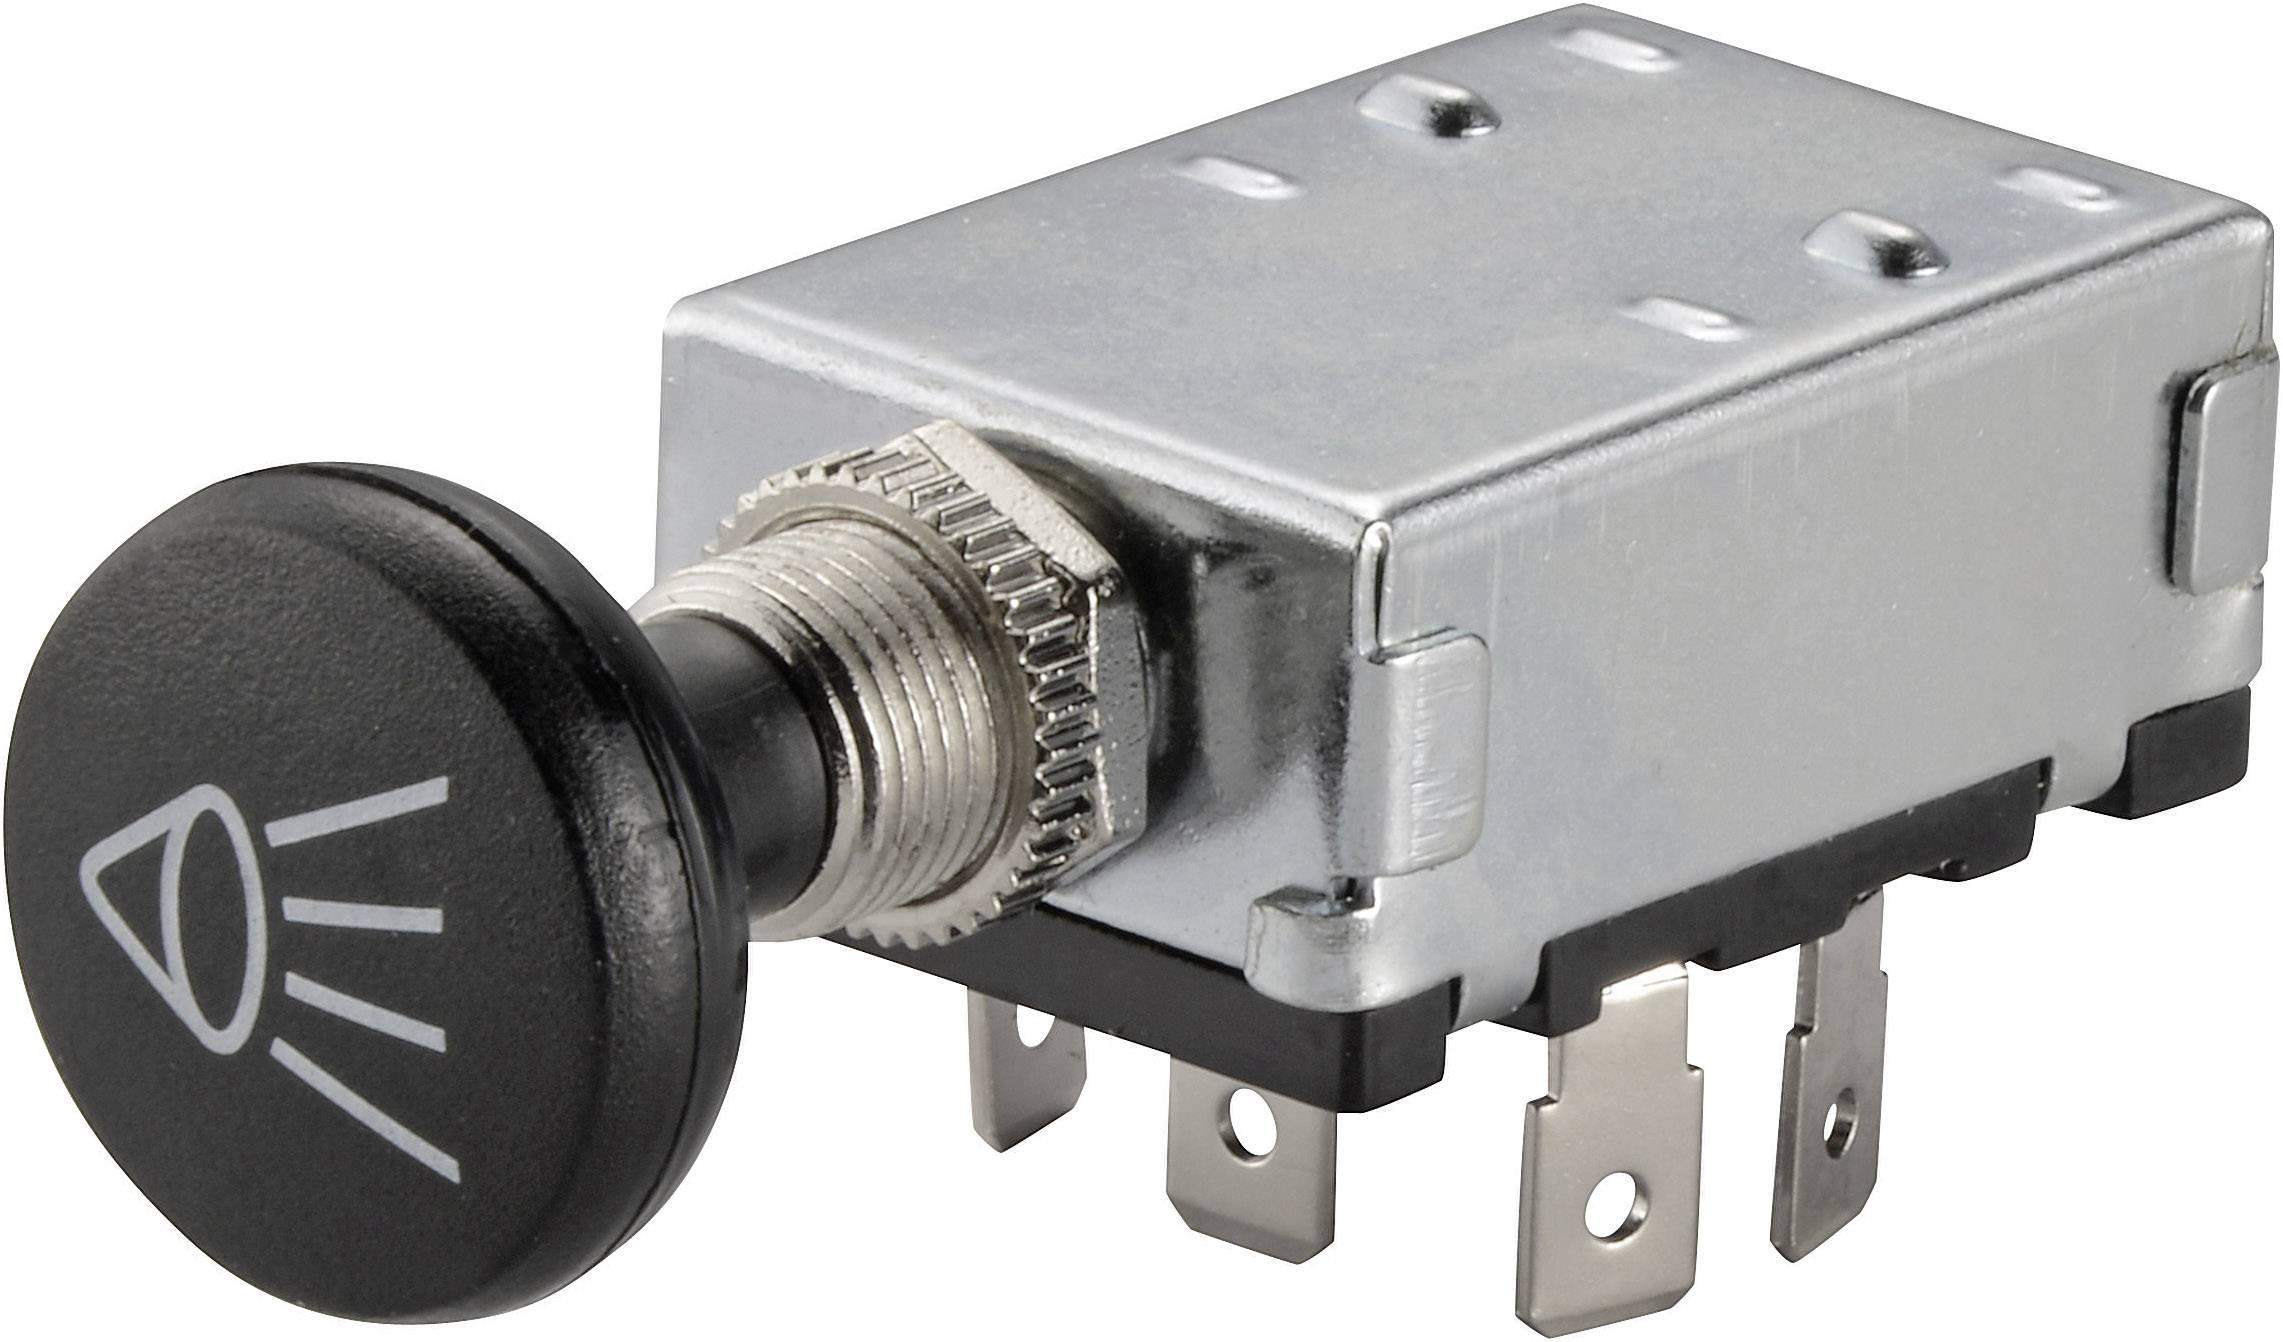 Vypínač do auta TRU COMPONENTS TC-A3-20B-SQ, 12 V/DC, 30 A, s aretací, 1 ks